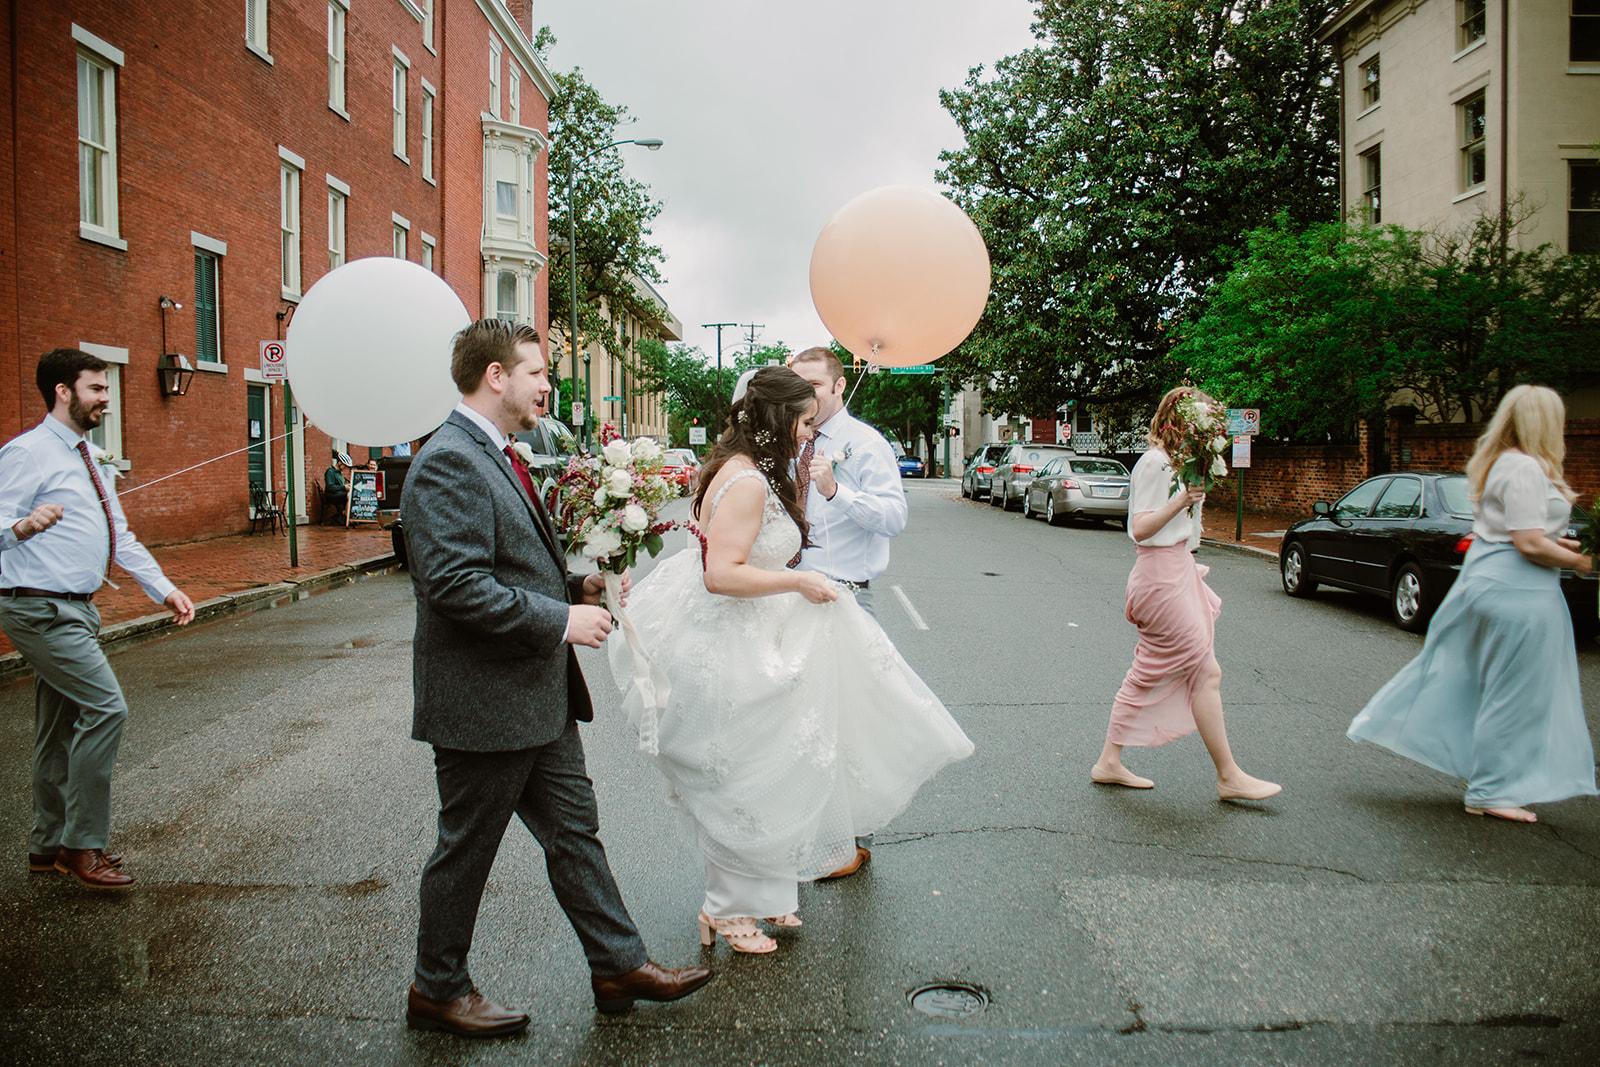 SarahMattozziPhotography-EmilyColin-LindenRowInnWedding-WeddingParty-10.jpg